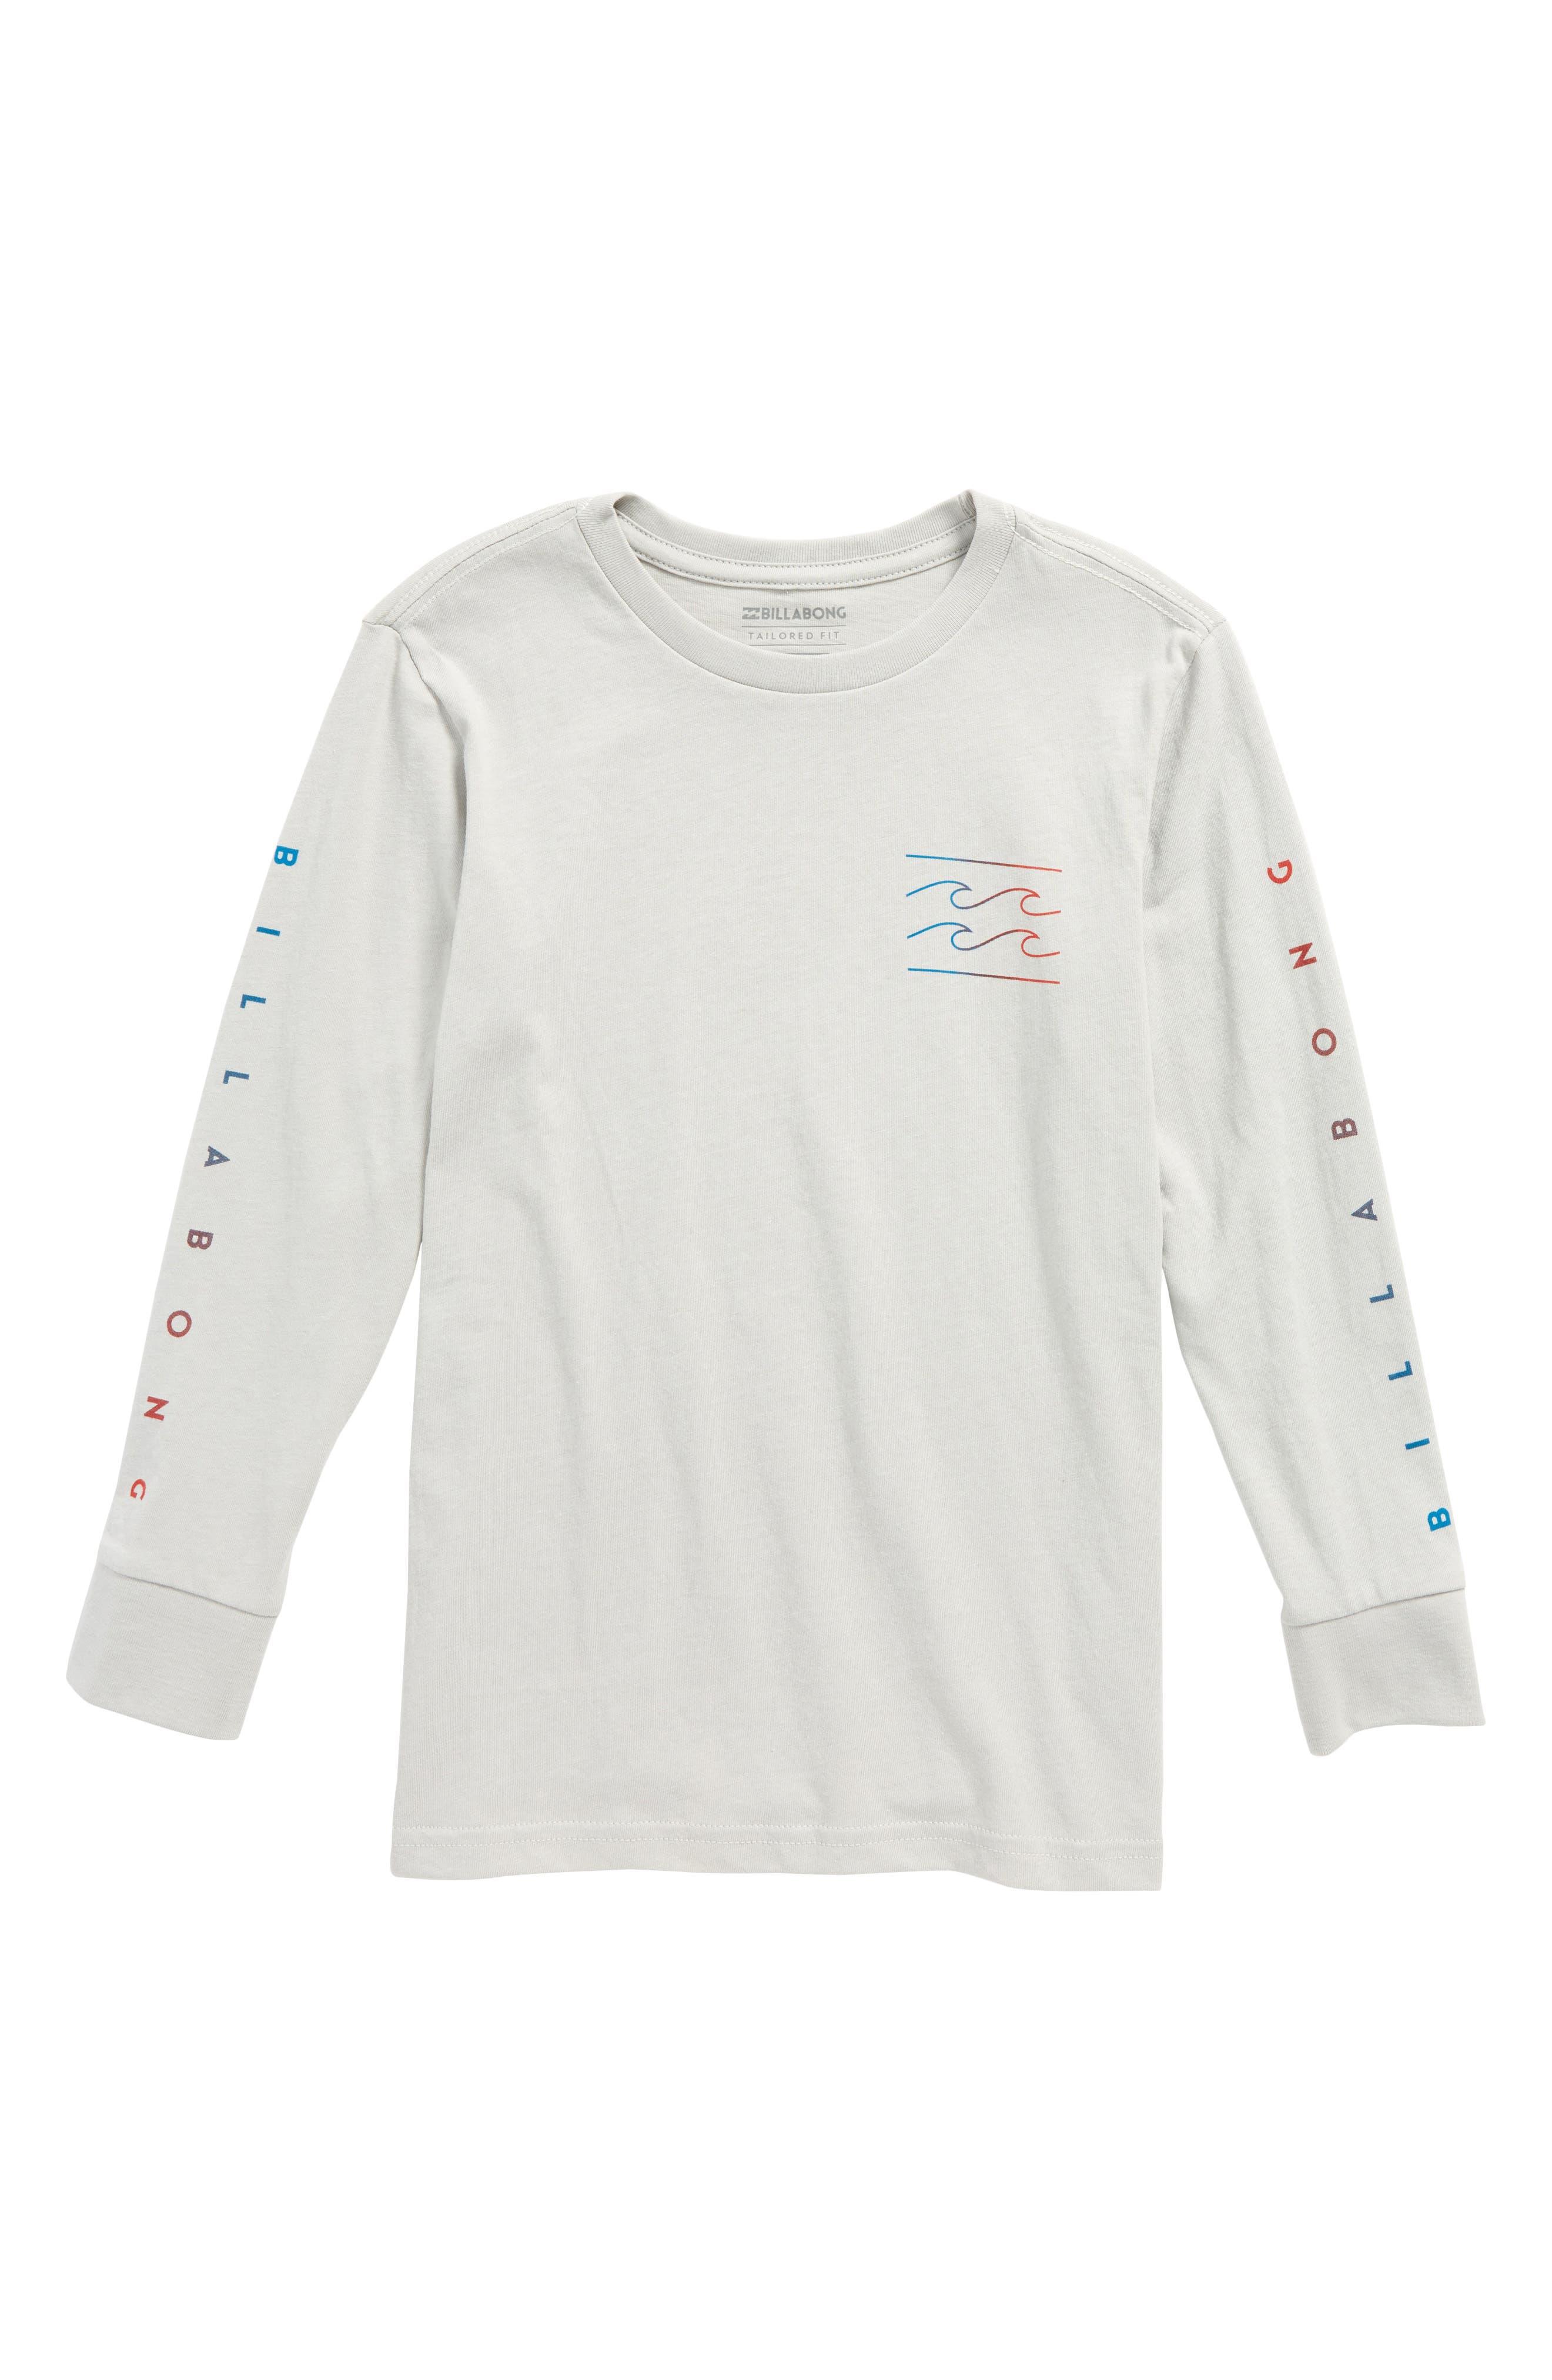 Unity Graphic Long Sleeve T-Shirt,                             Main thumbnail 1, color,                             020